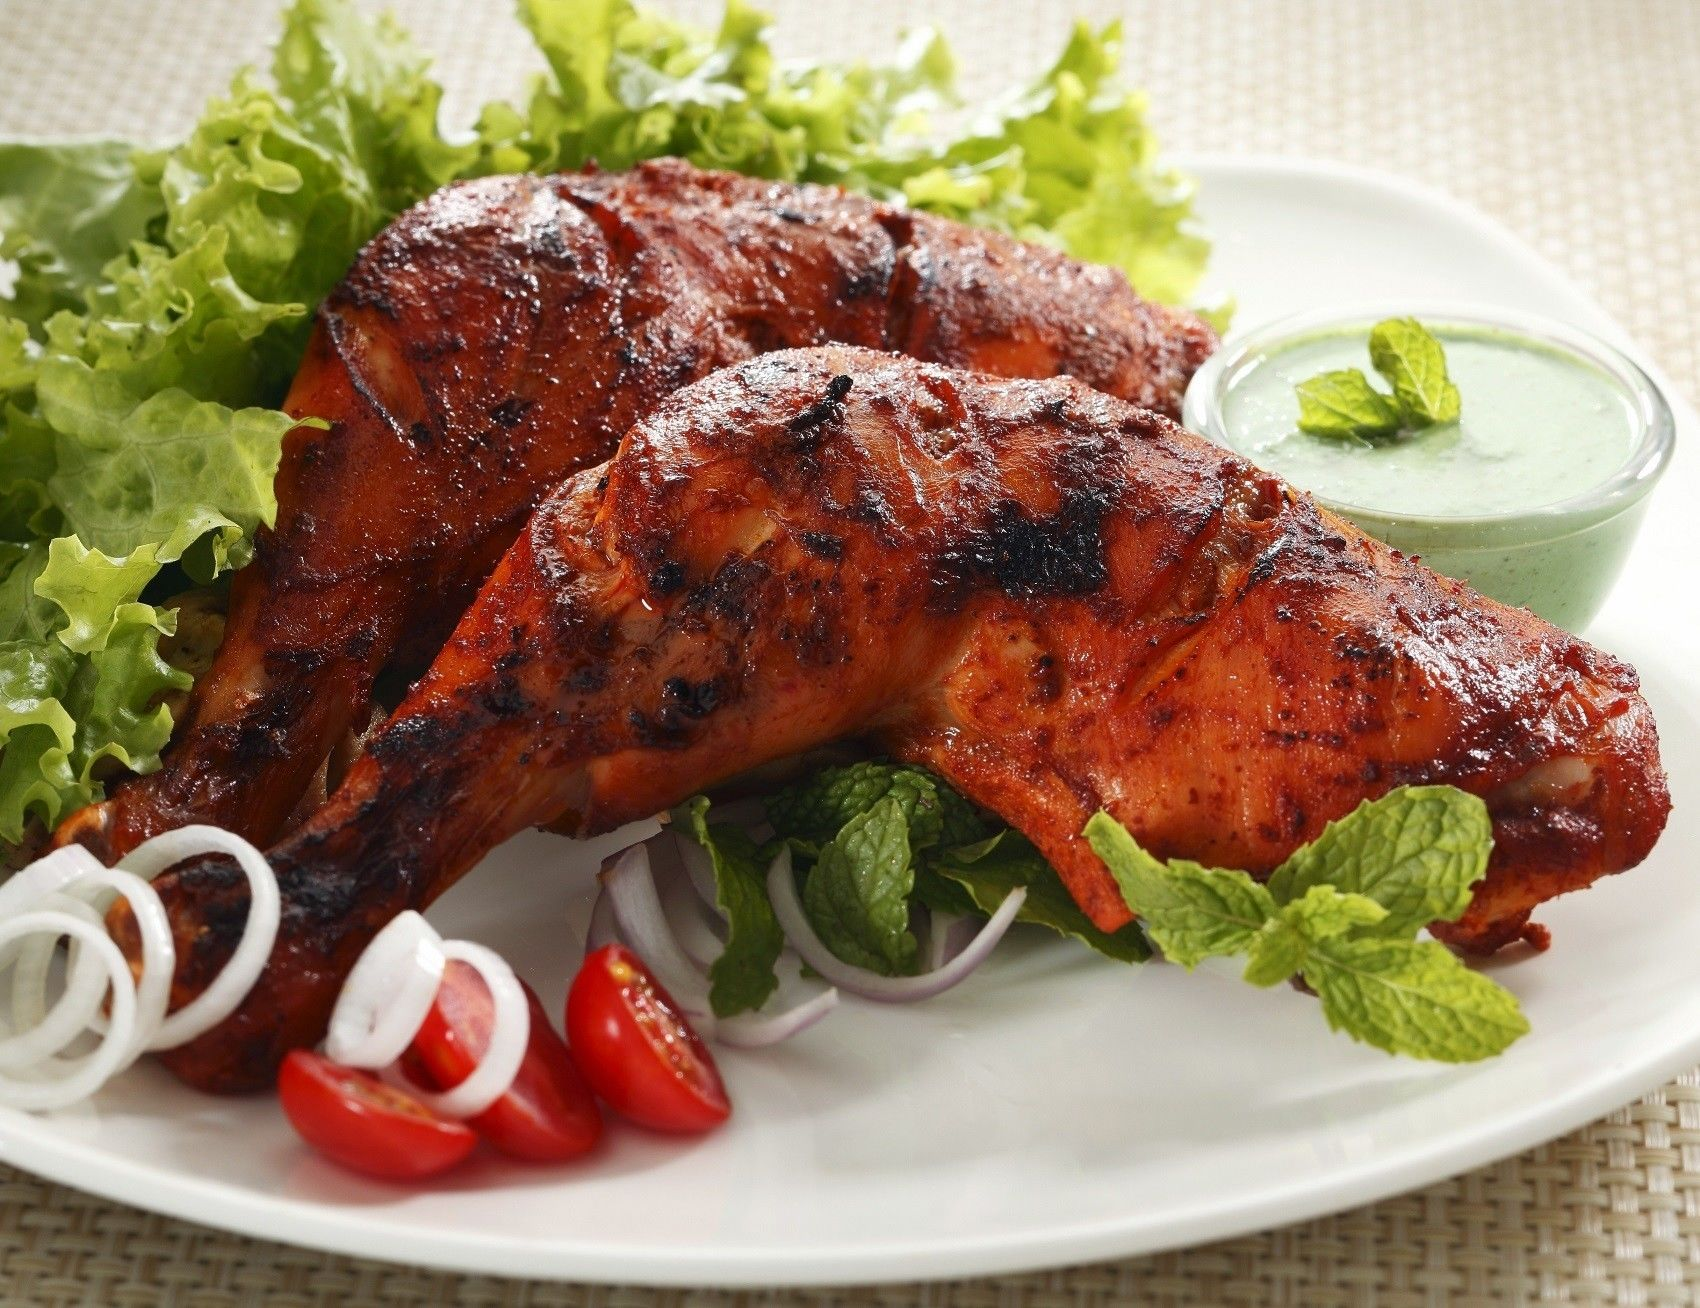 Eat Tandoori Chicken when you travel to India